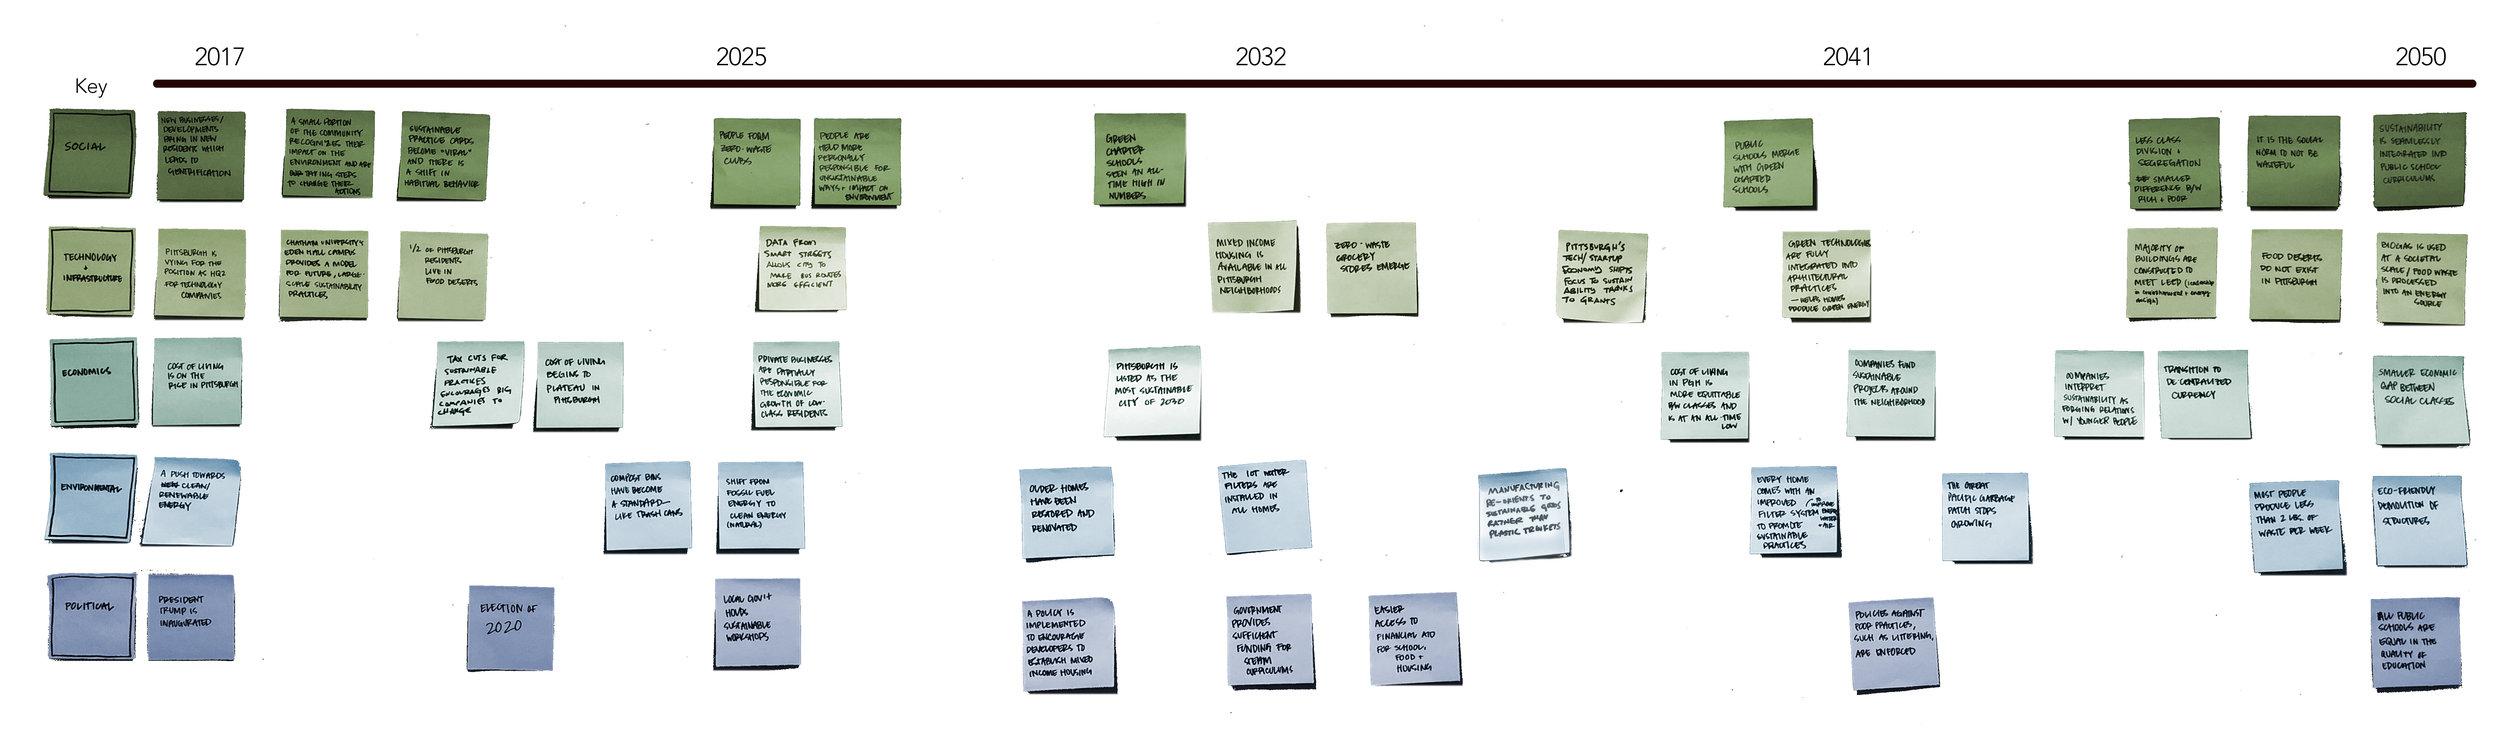 Preferred Future Timeline.jpg